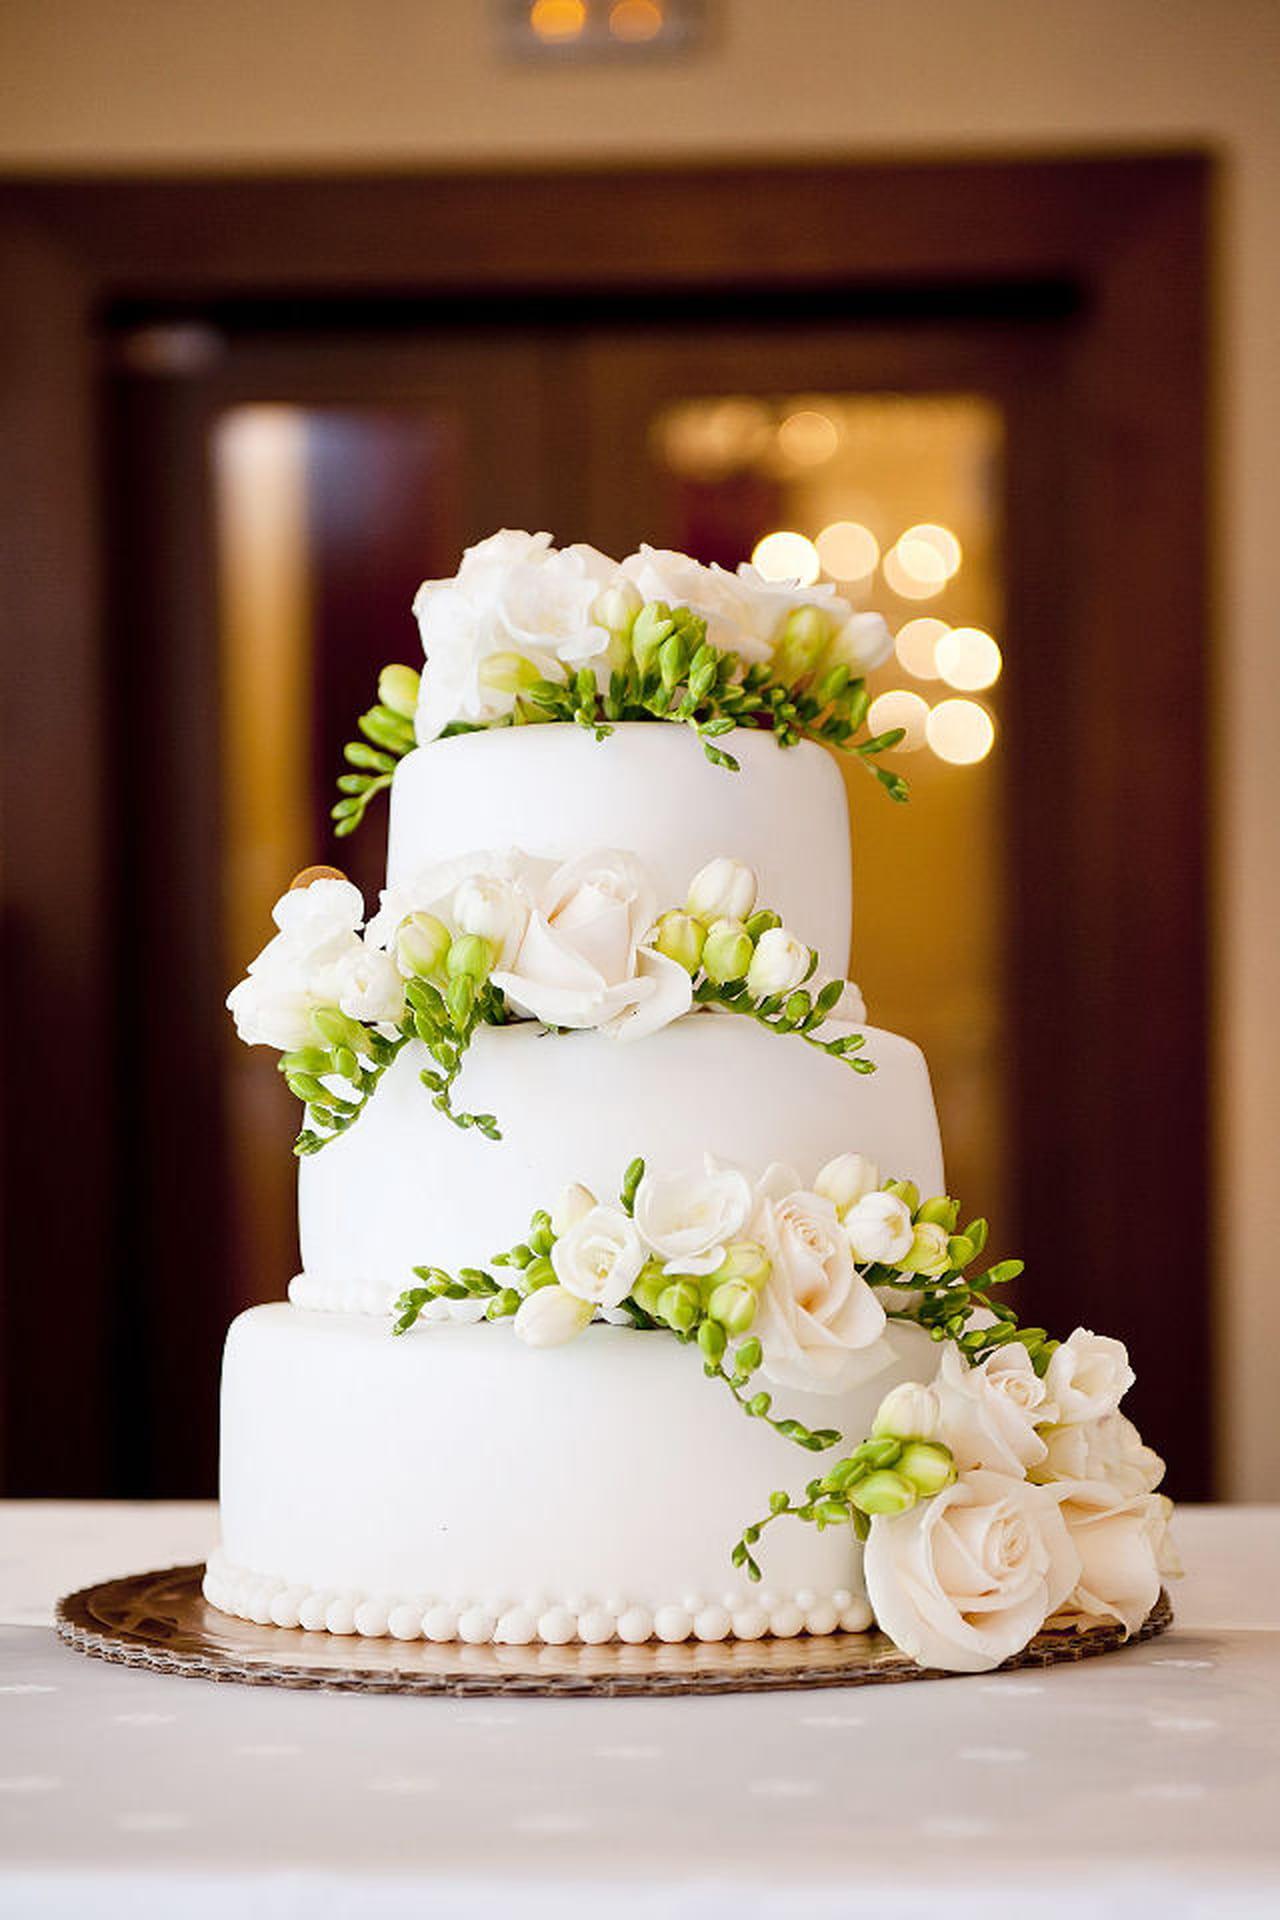 Amato Torte eleganti: 10 idee raffinate per il vostro matrimonio ZB91